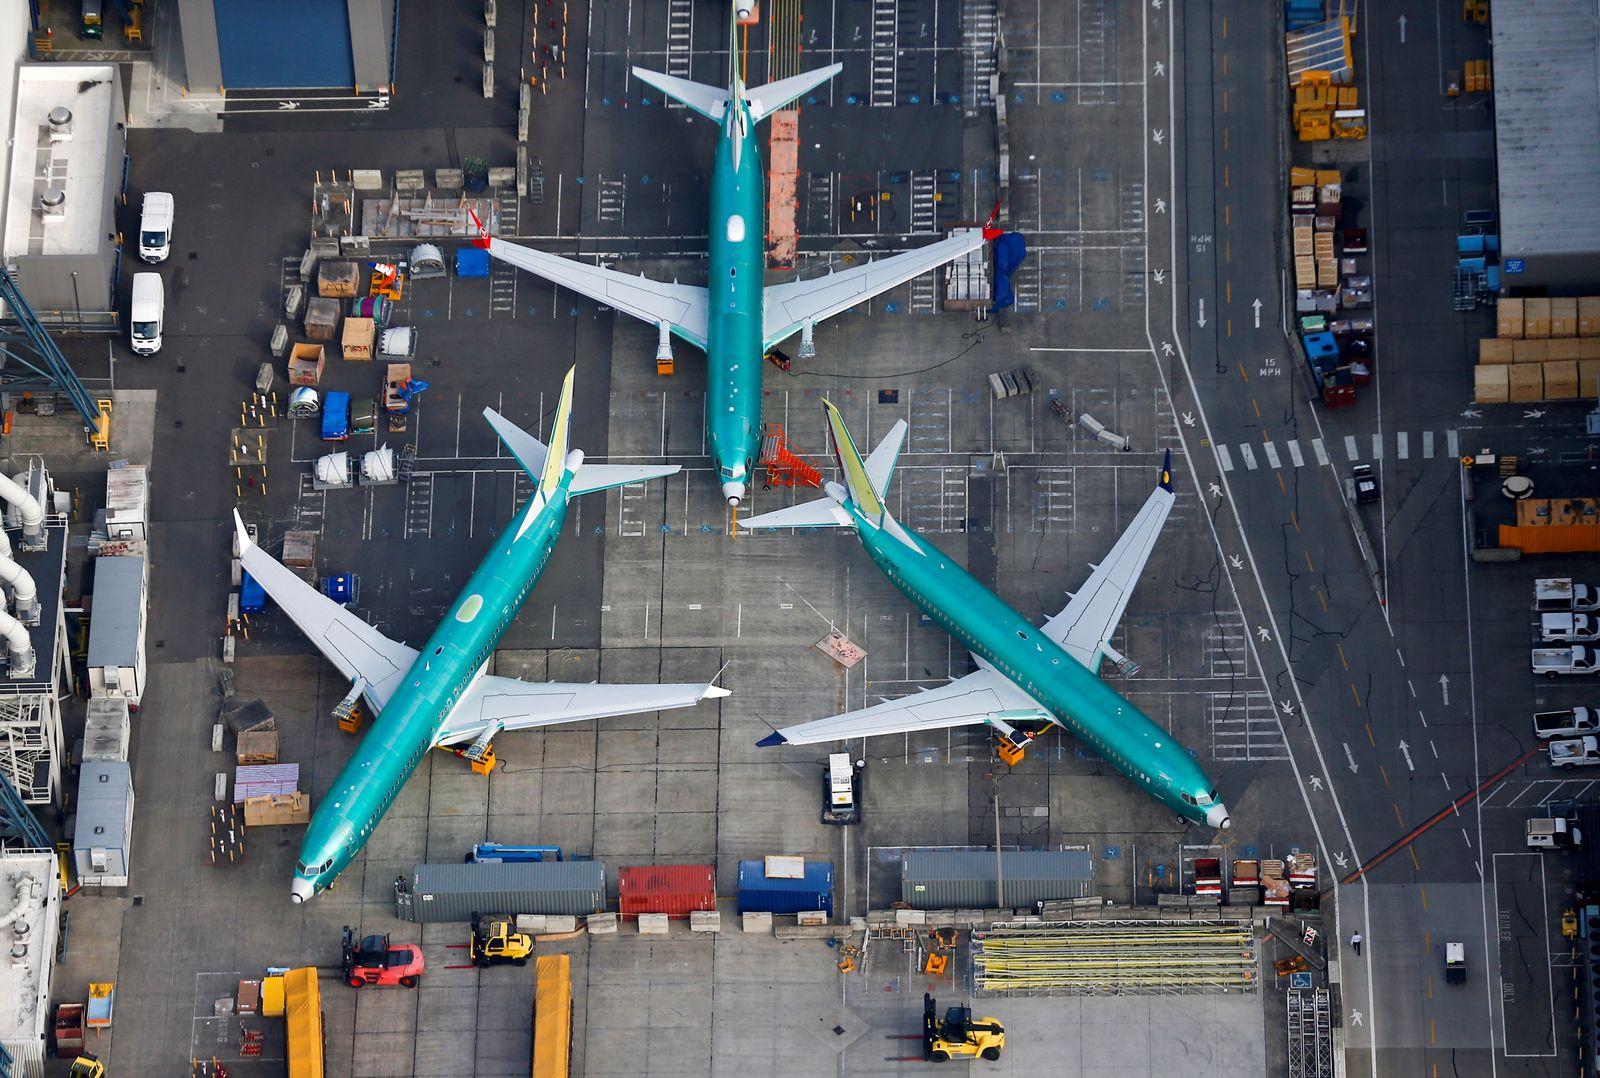 ETHIOPIA-AIRPLANE/FAA